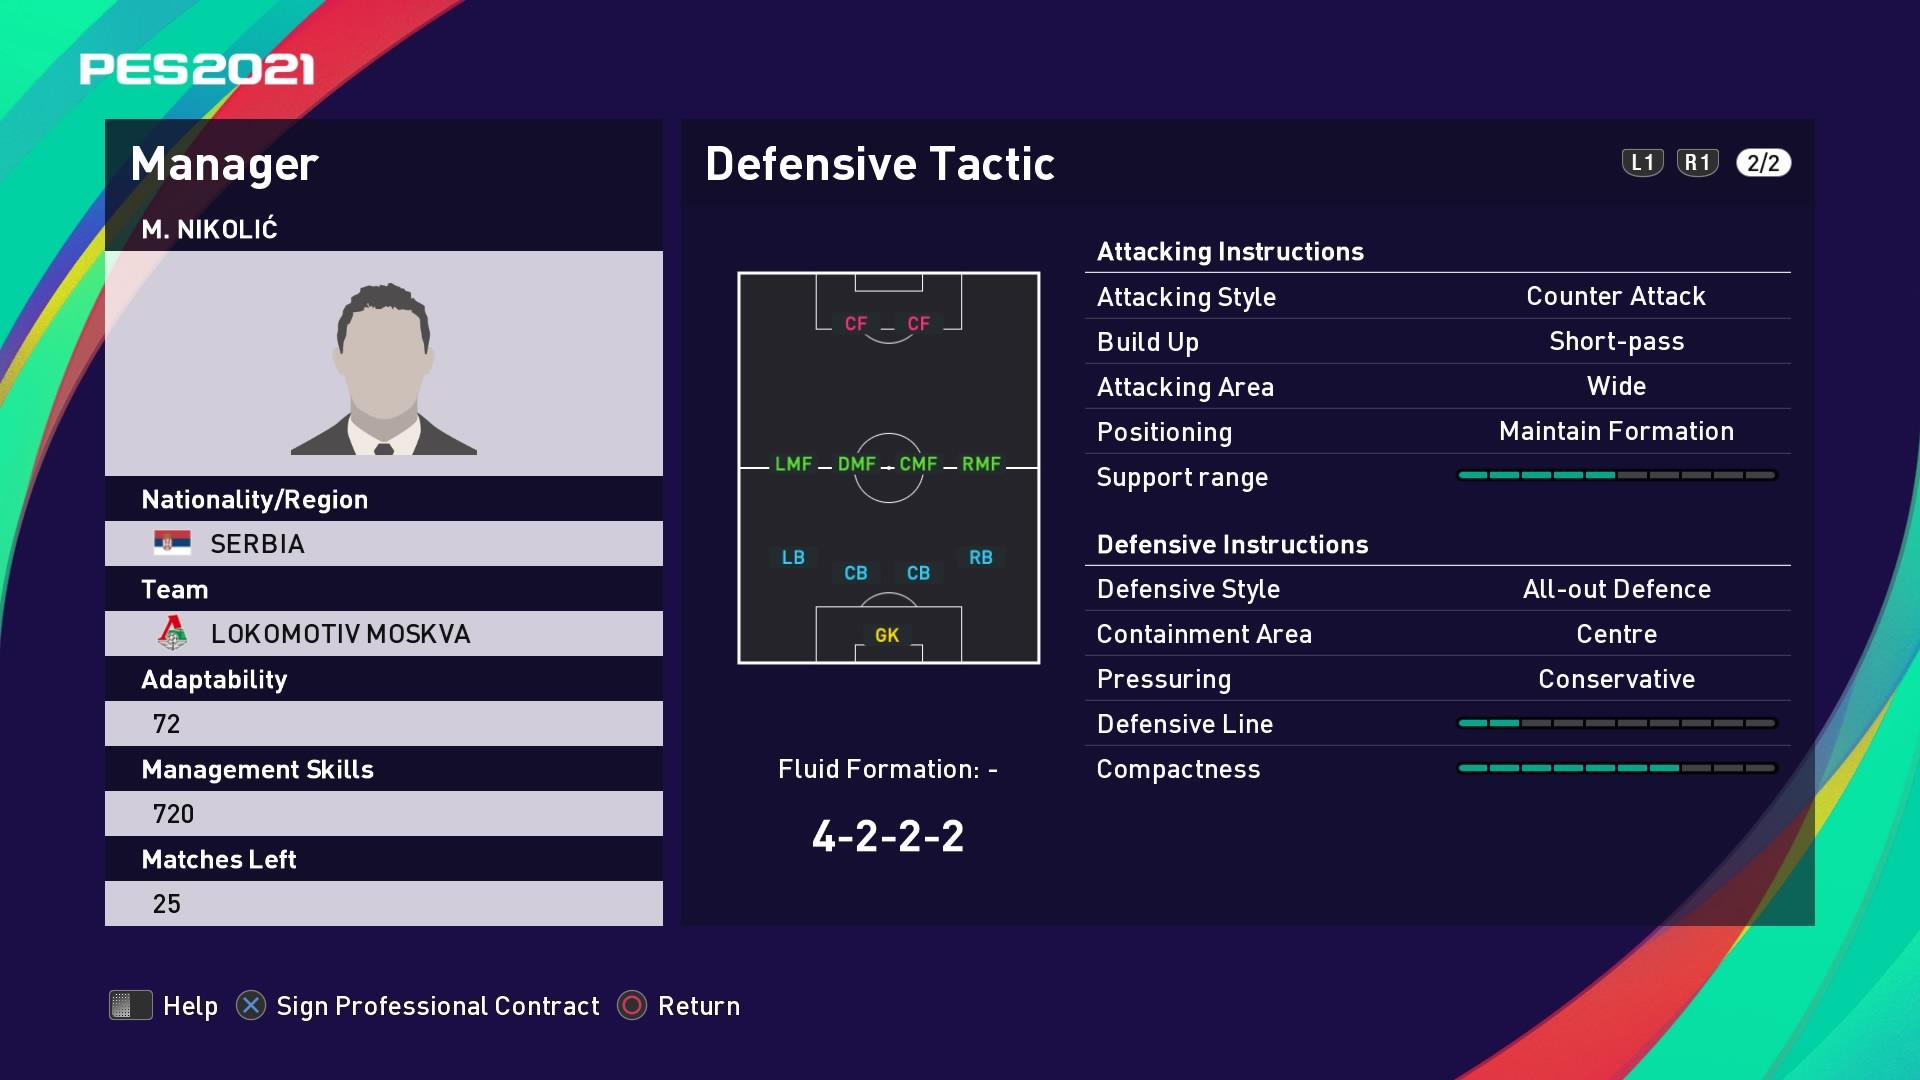 M. Nikolić (Marko Nikolić) Defensive Tactic in PES 2021 myClub